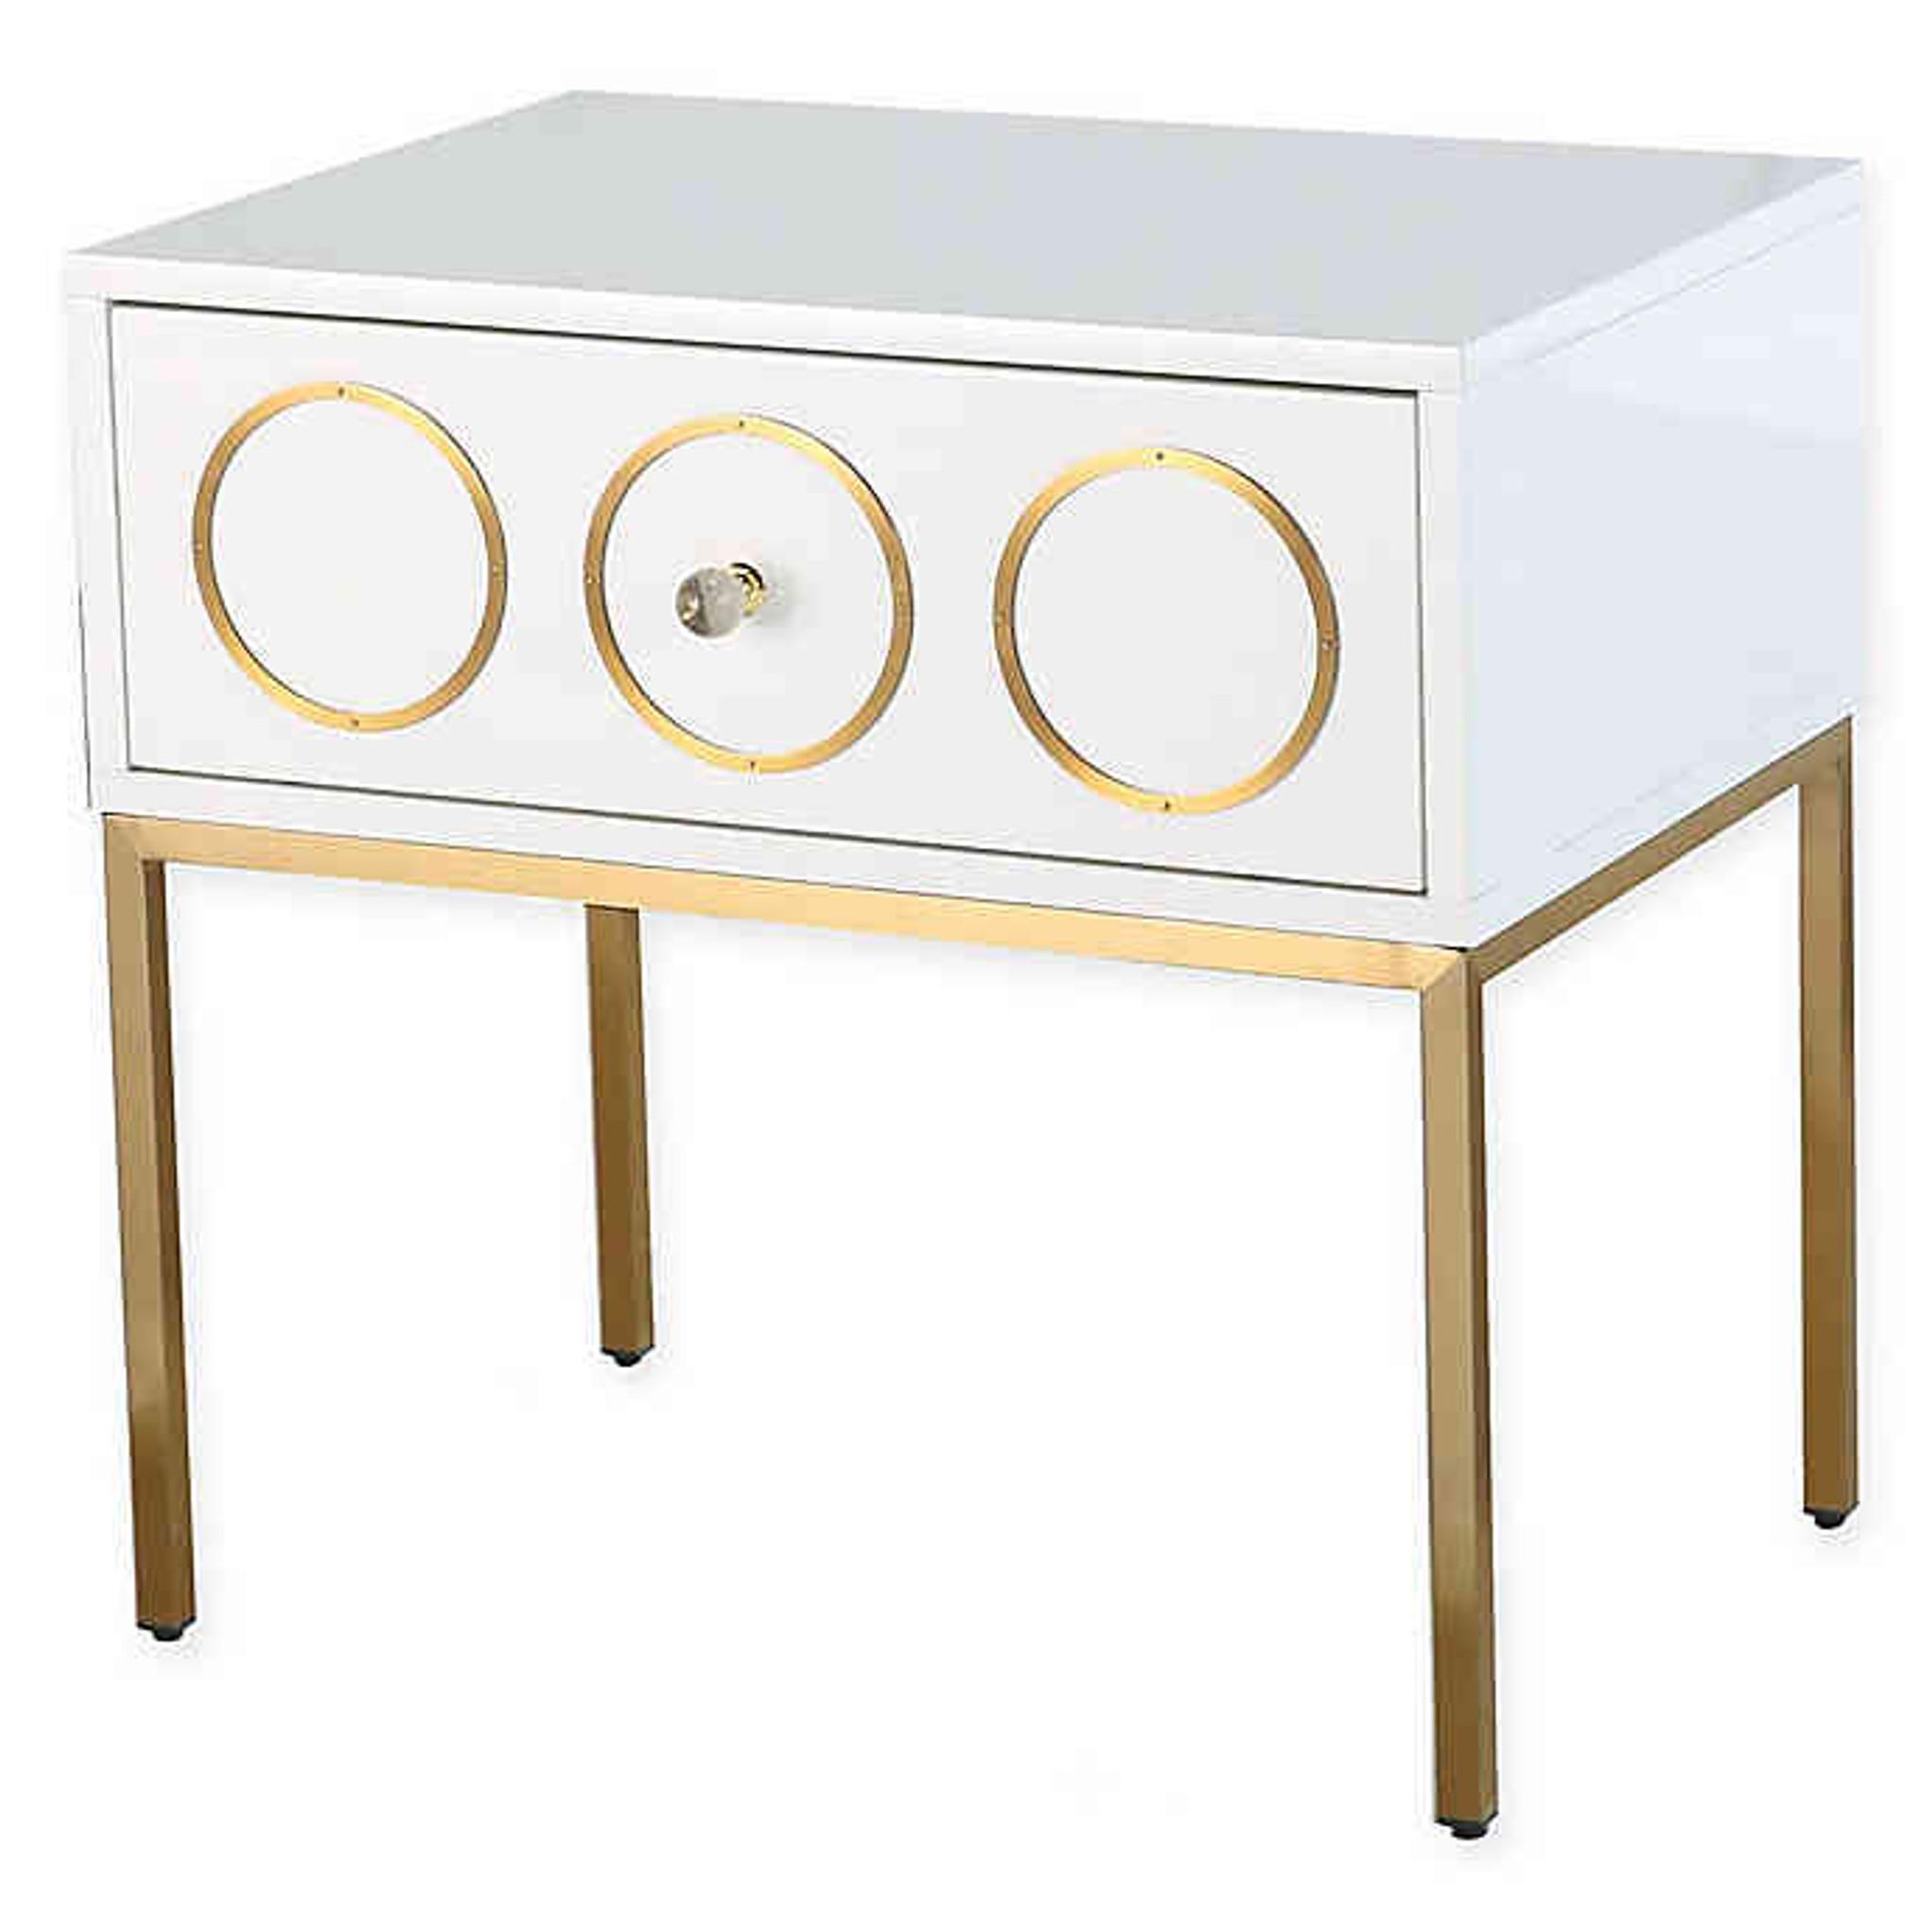 tov ella side table white nightstand one drawer storage gold legs